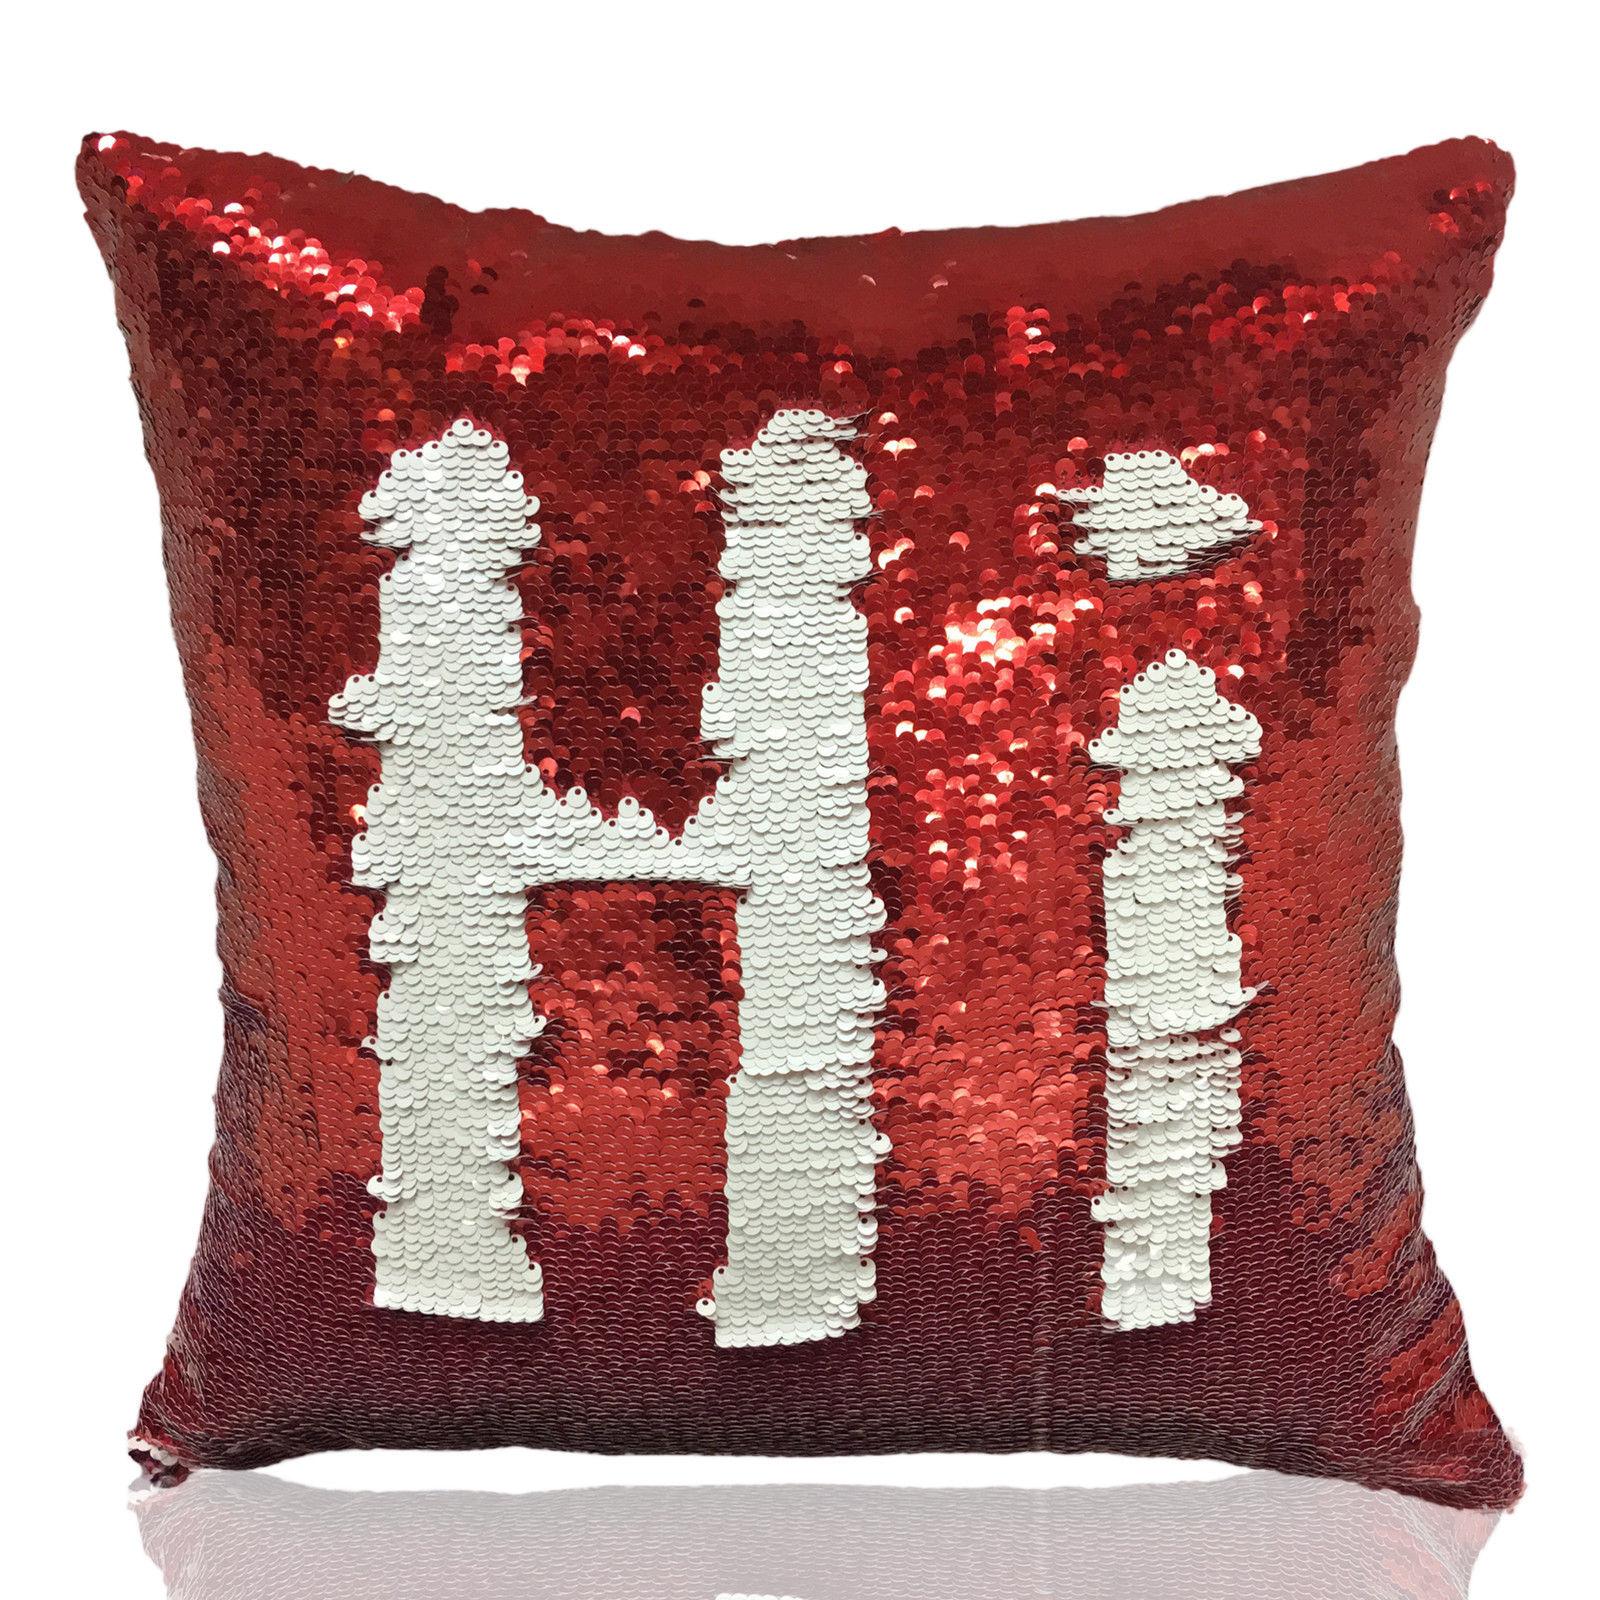 Mermaid Glitter Pillow Cover Cushion Case Reversible Sequin Magic